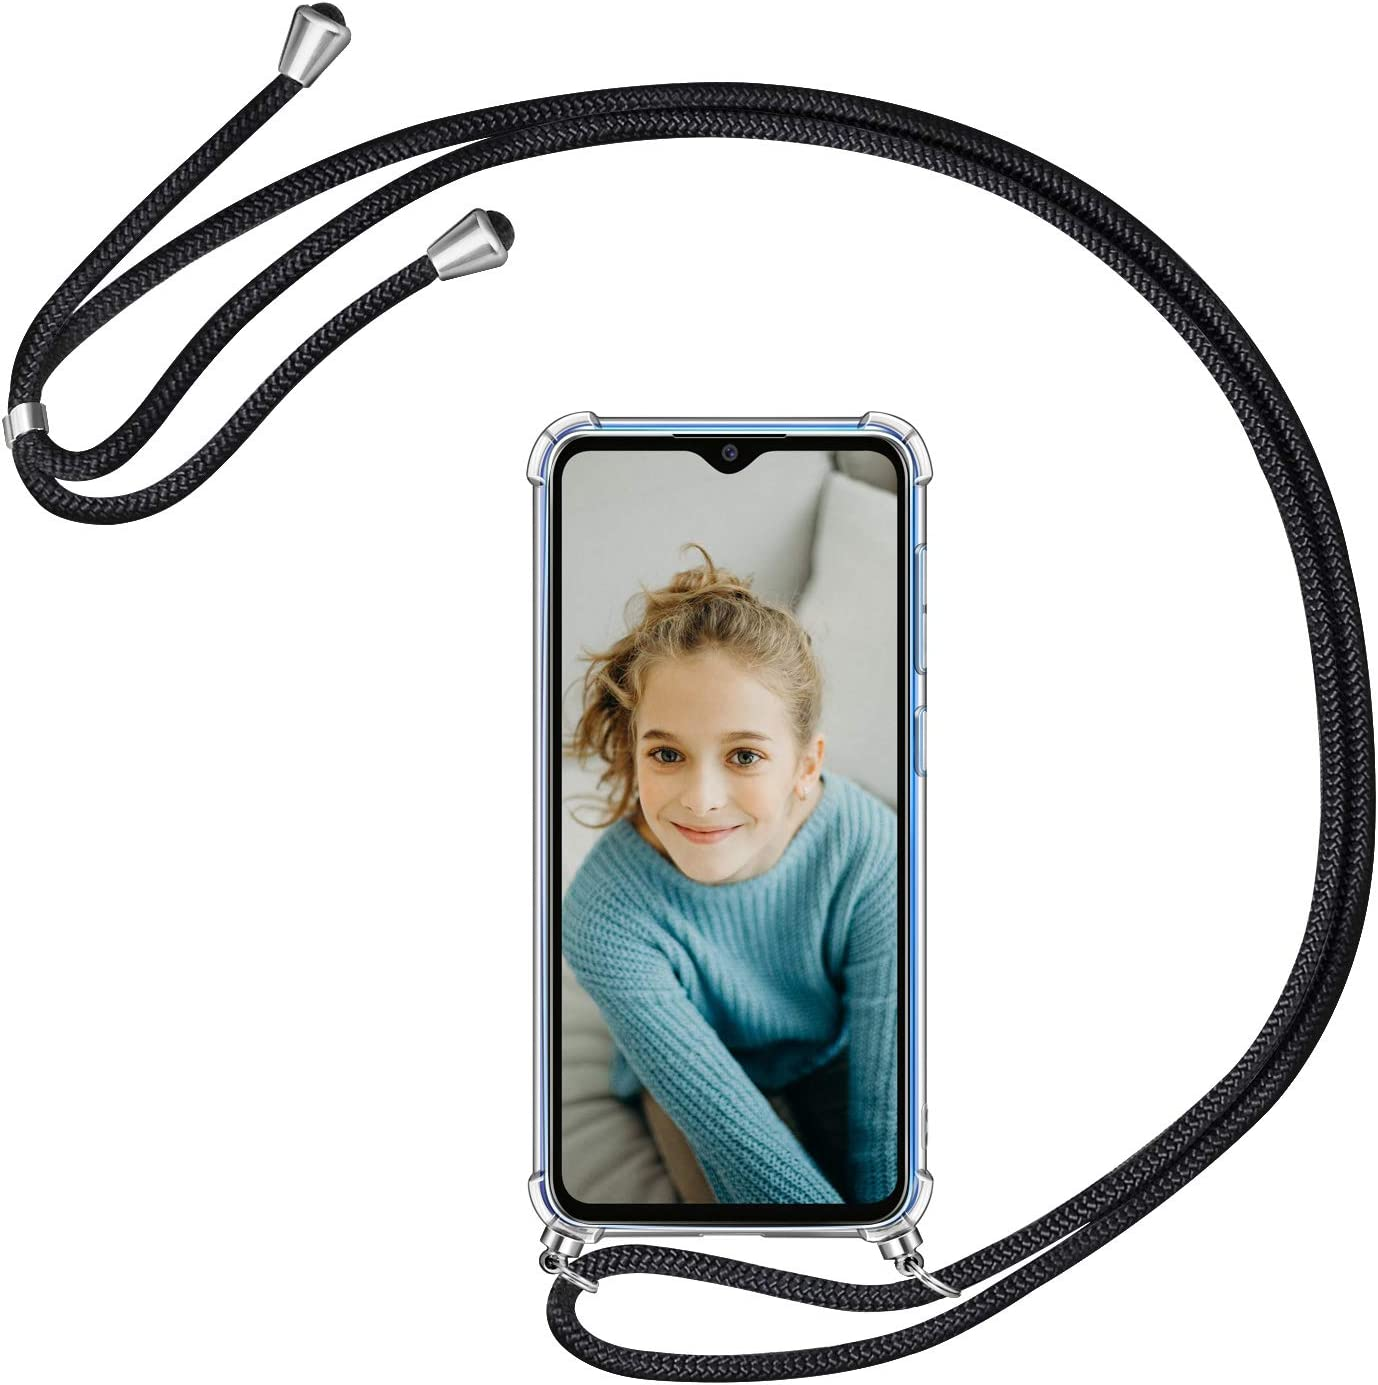 AROYI Funda con Cuerda para Xiaomi Redmi Note 8 Pro, Carcasa Transparente TPU Silicona Case con Colgante Ajustable Collar Correa de Cuello Cordón para Xiaomi Redmi Note 8 Pro, Negro